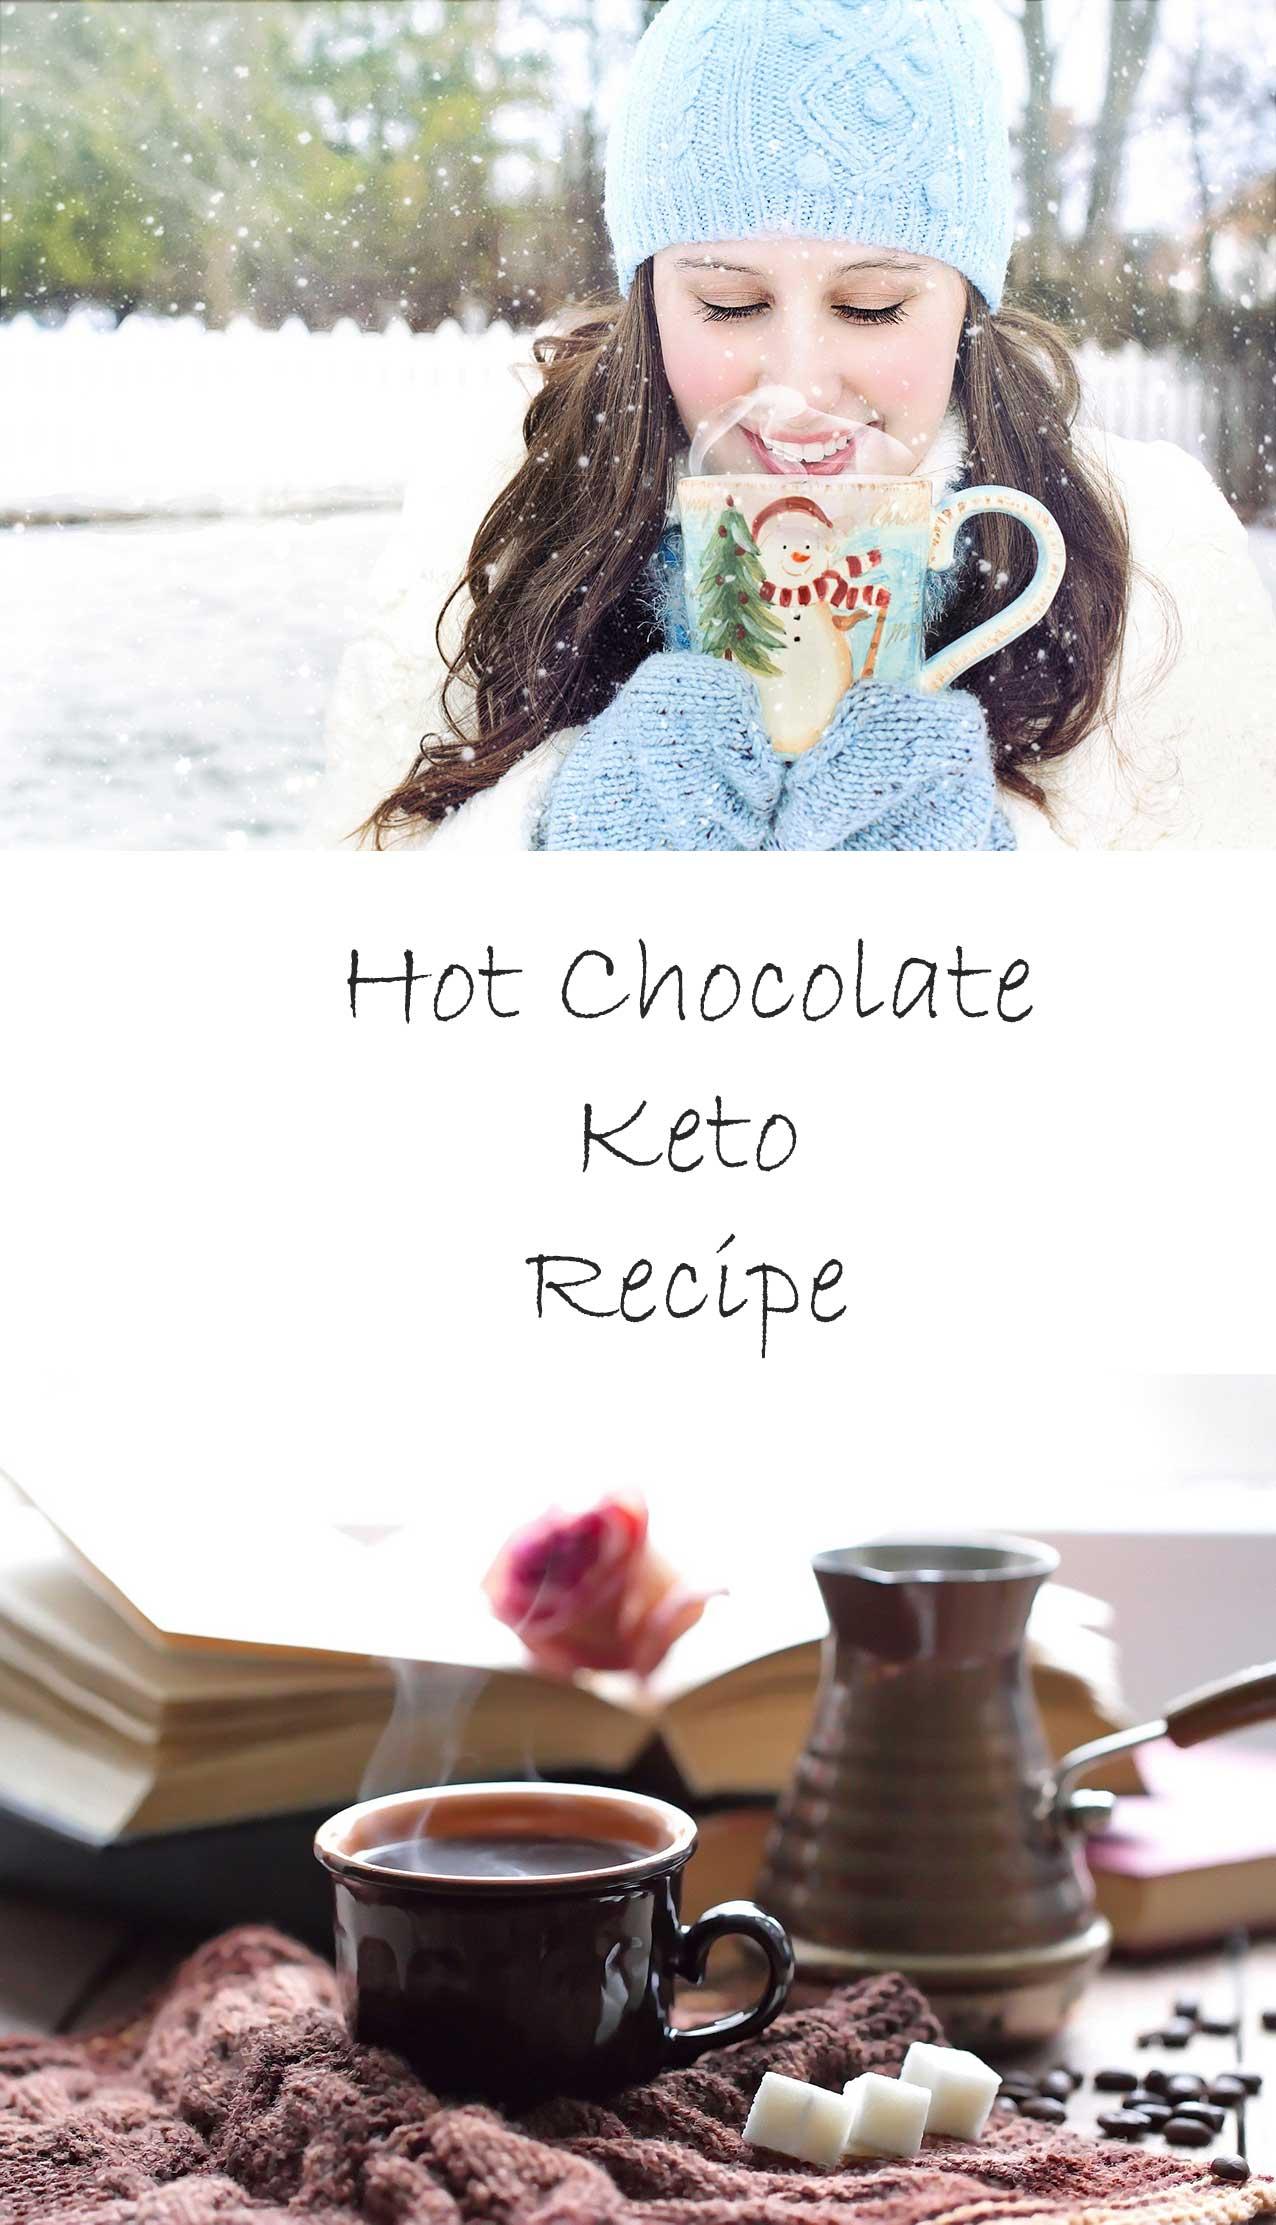 easy keto recipe, hot chocolate recipe, keto drink